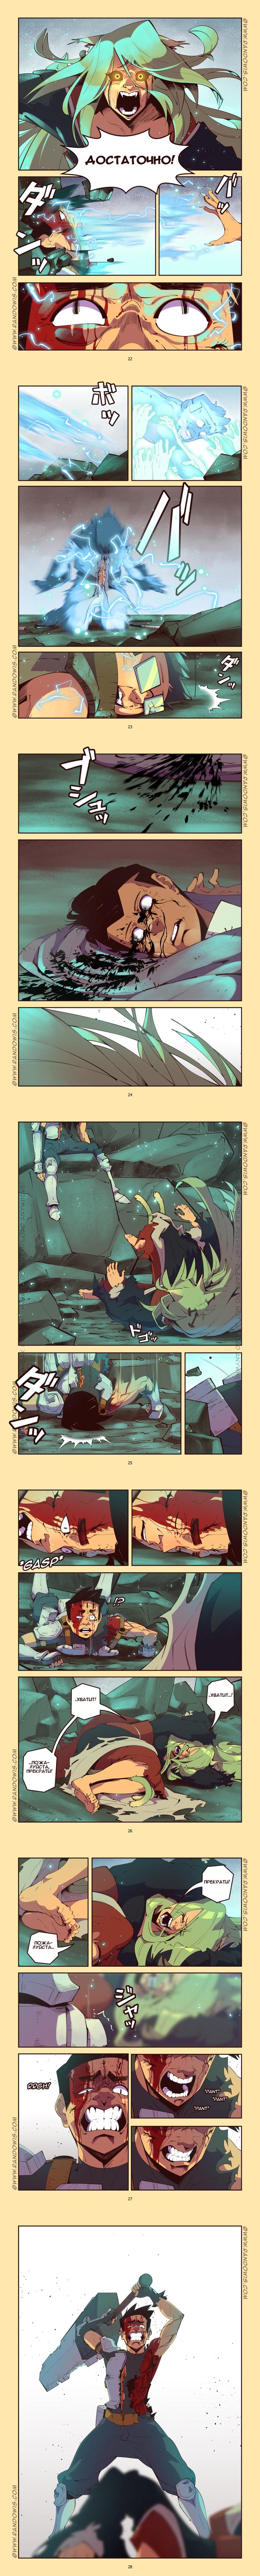 Мы живем в ММО?!Глава 7 ( 22 - 32 ст) Randowis, Комиксы, We Live in an MMO, MMO, Перевод, Длиннопост, Anime Art